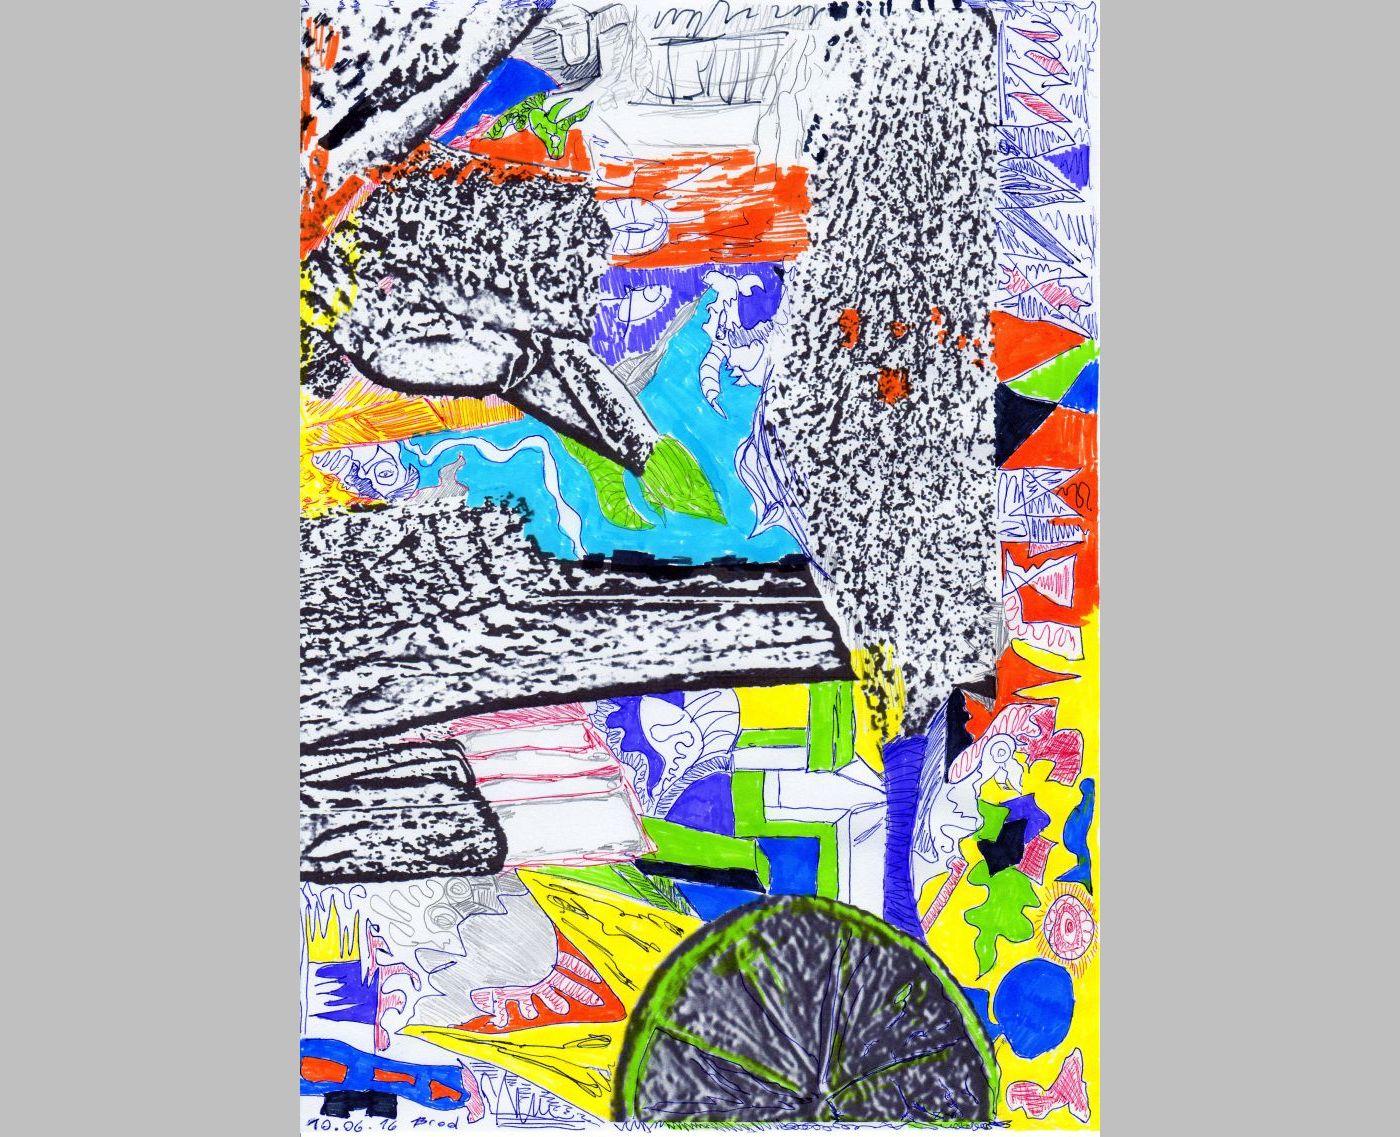 Ohne Titel (10.06.2016, 21 x 29,7 cm, A4)